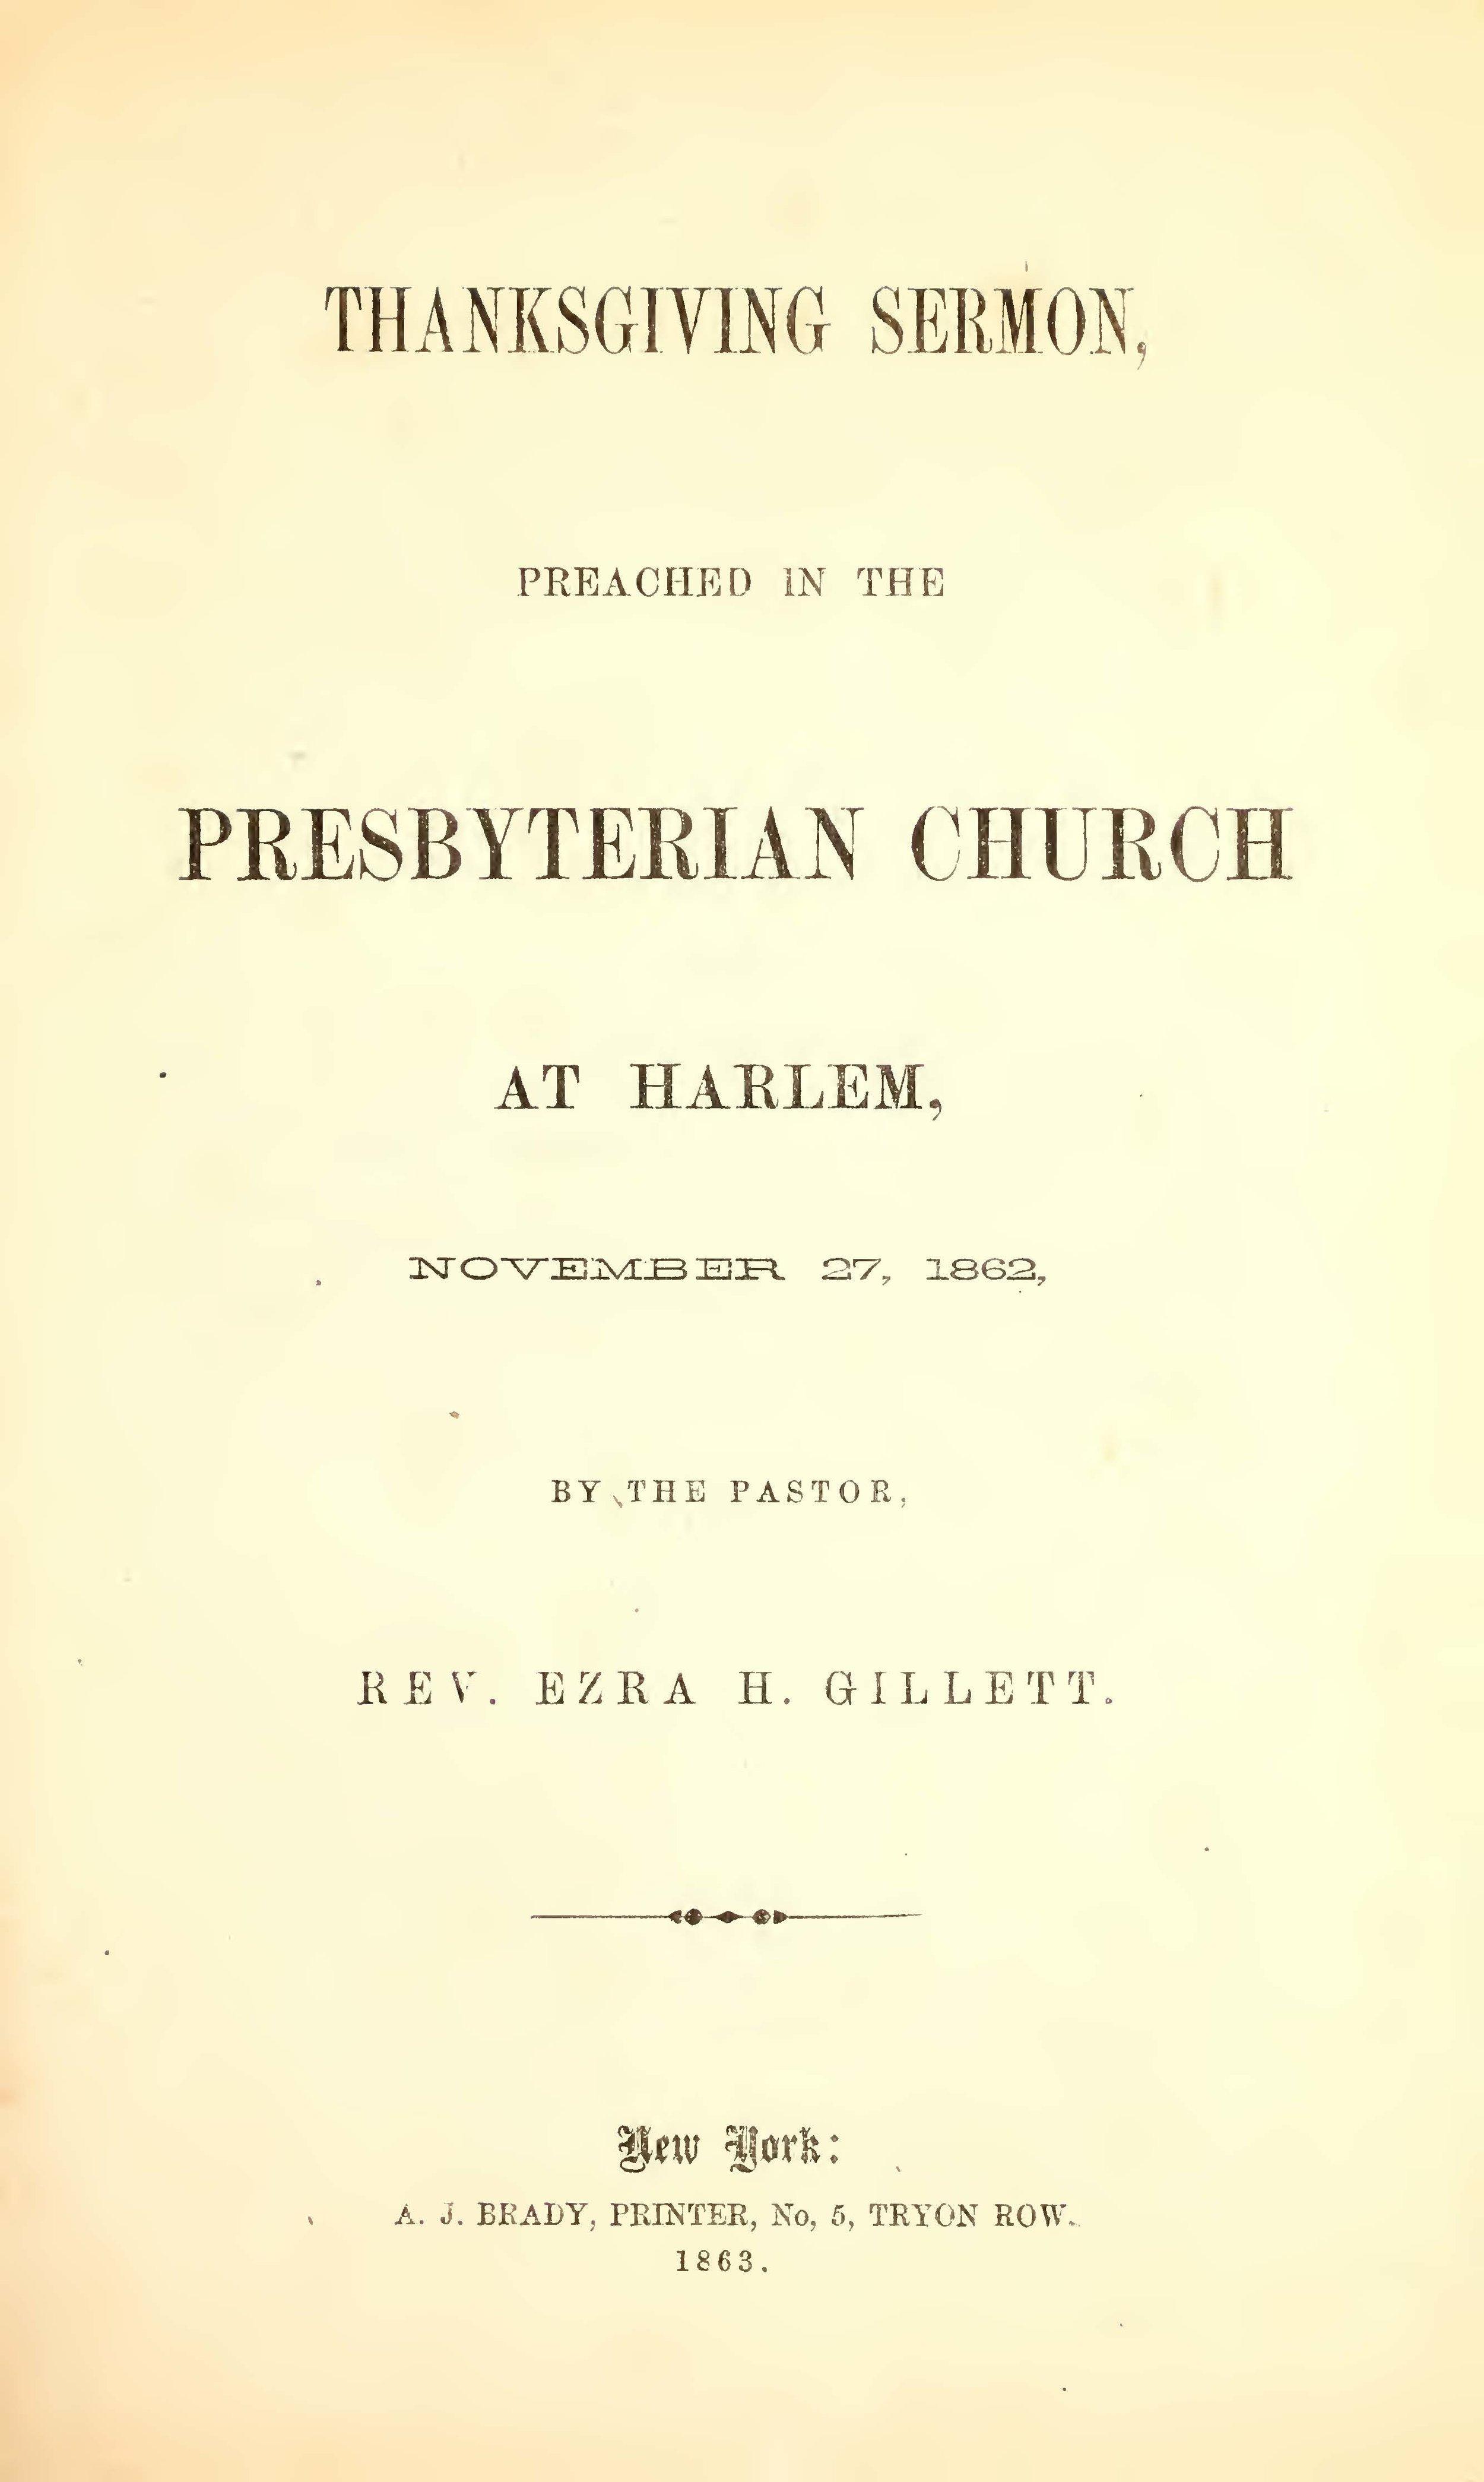 Gillett, Ezra Hall, Thanksgiving Sermon Title Page.jpg